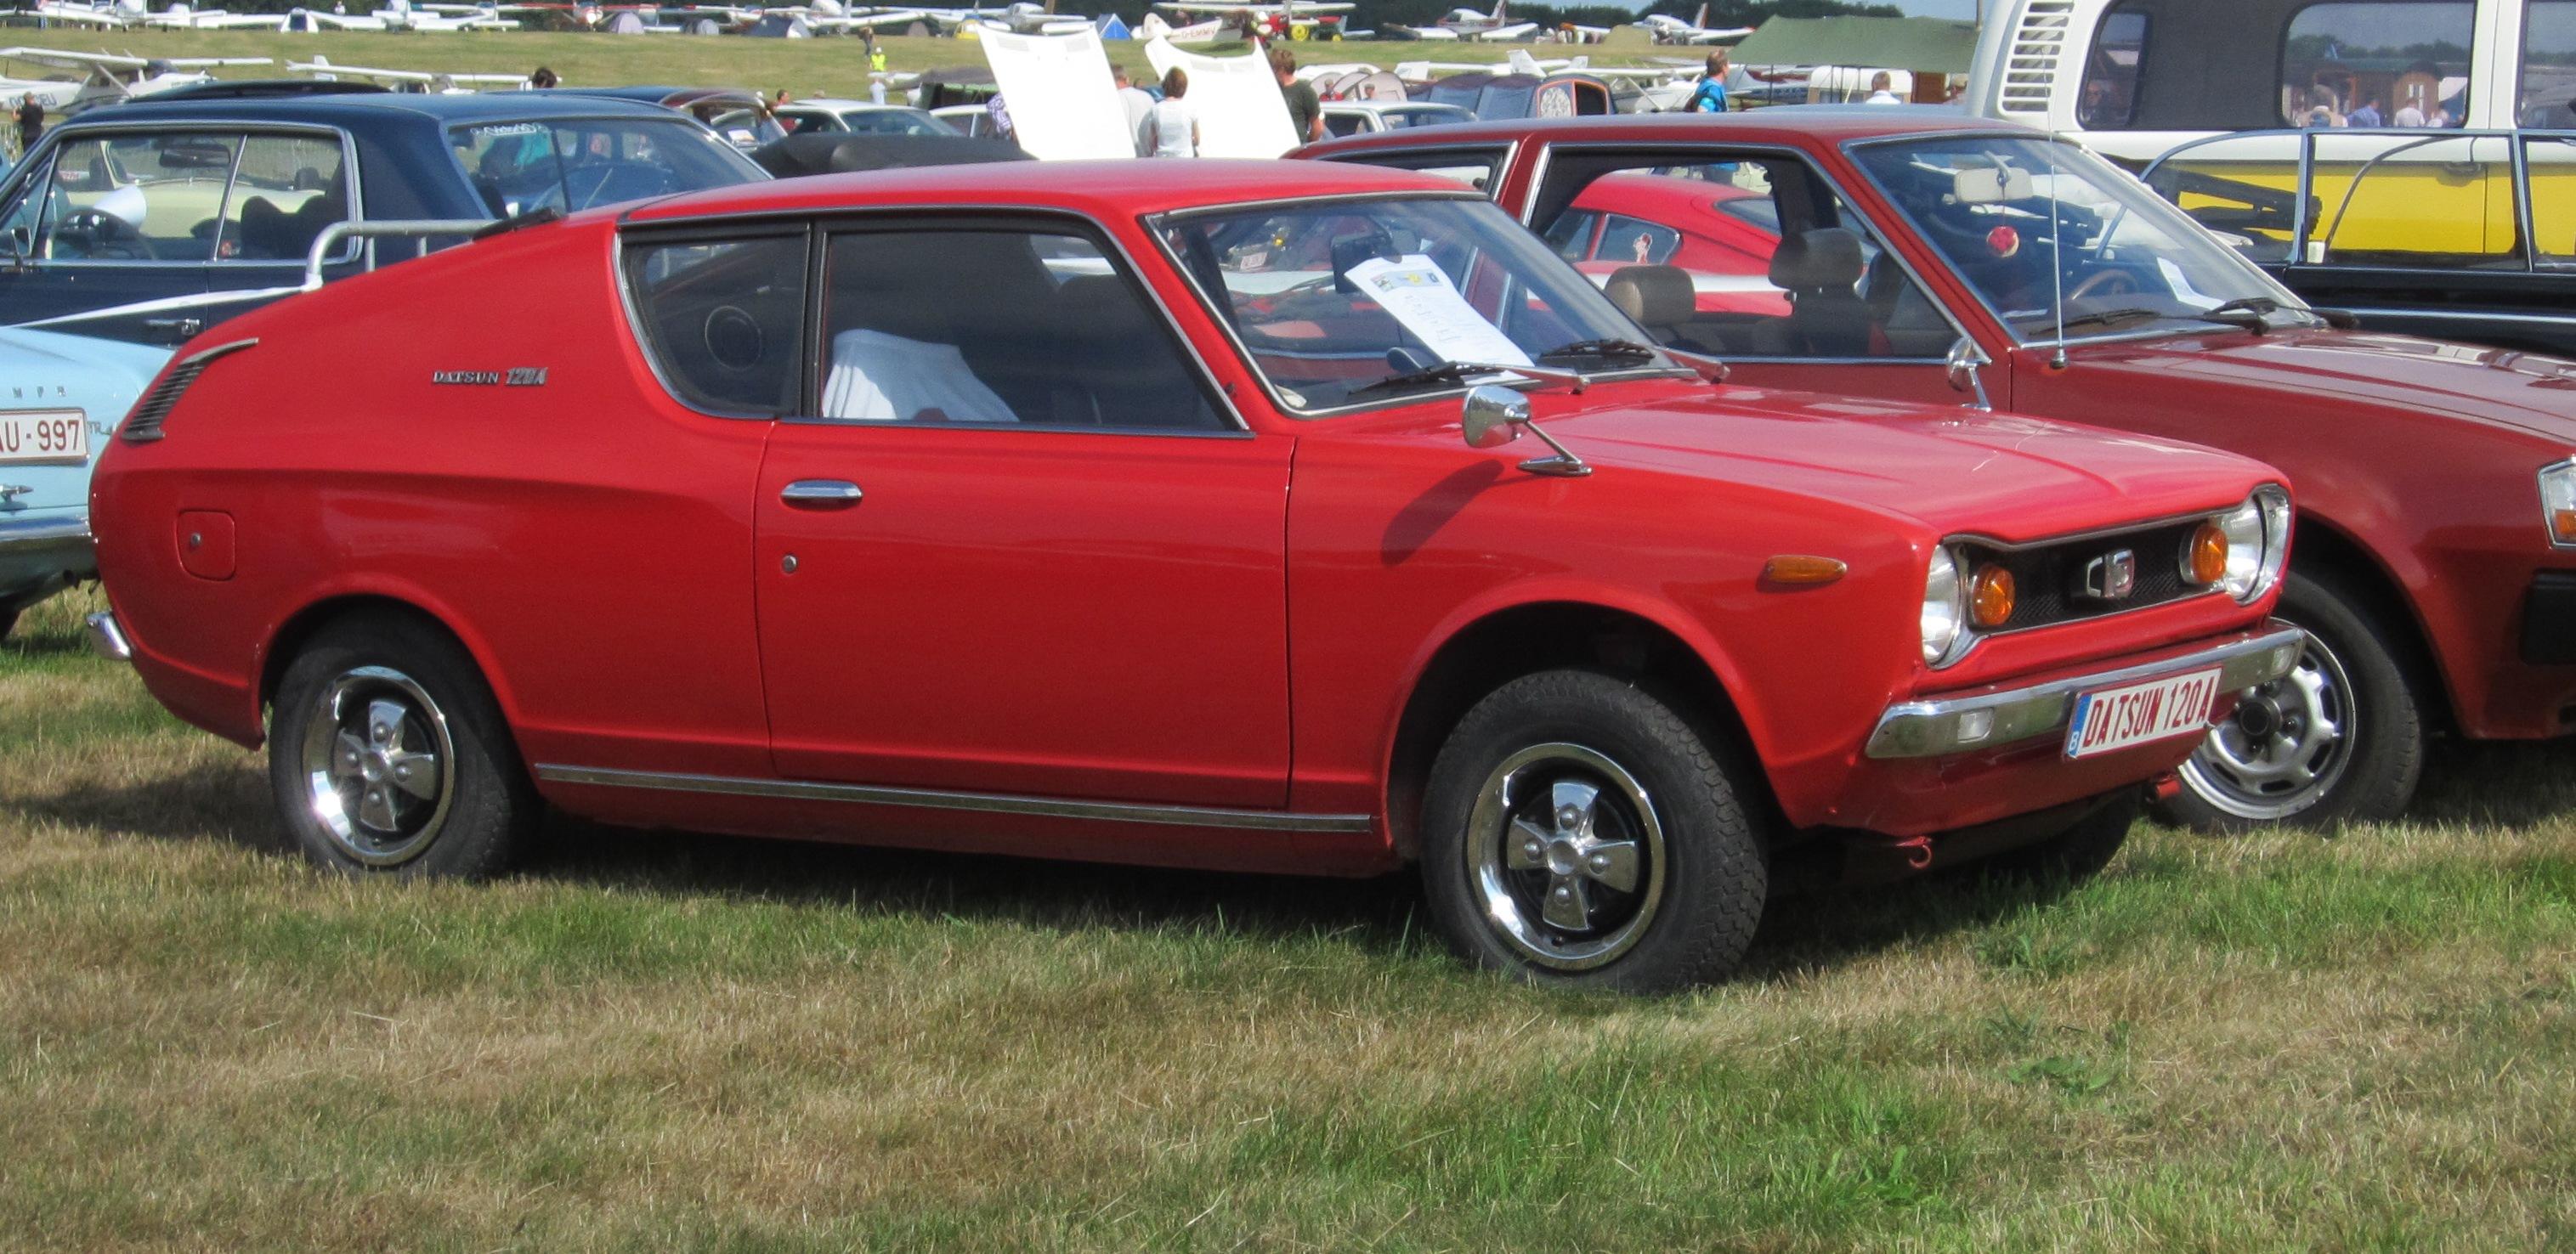 File:Datsun Cherry 120A according to European nomenclature ...